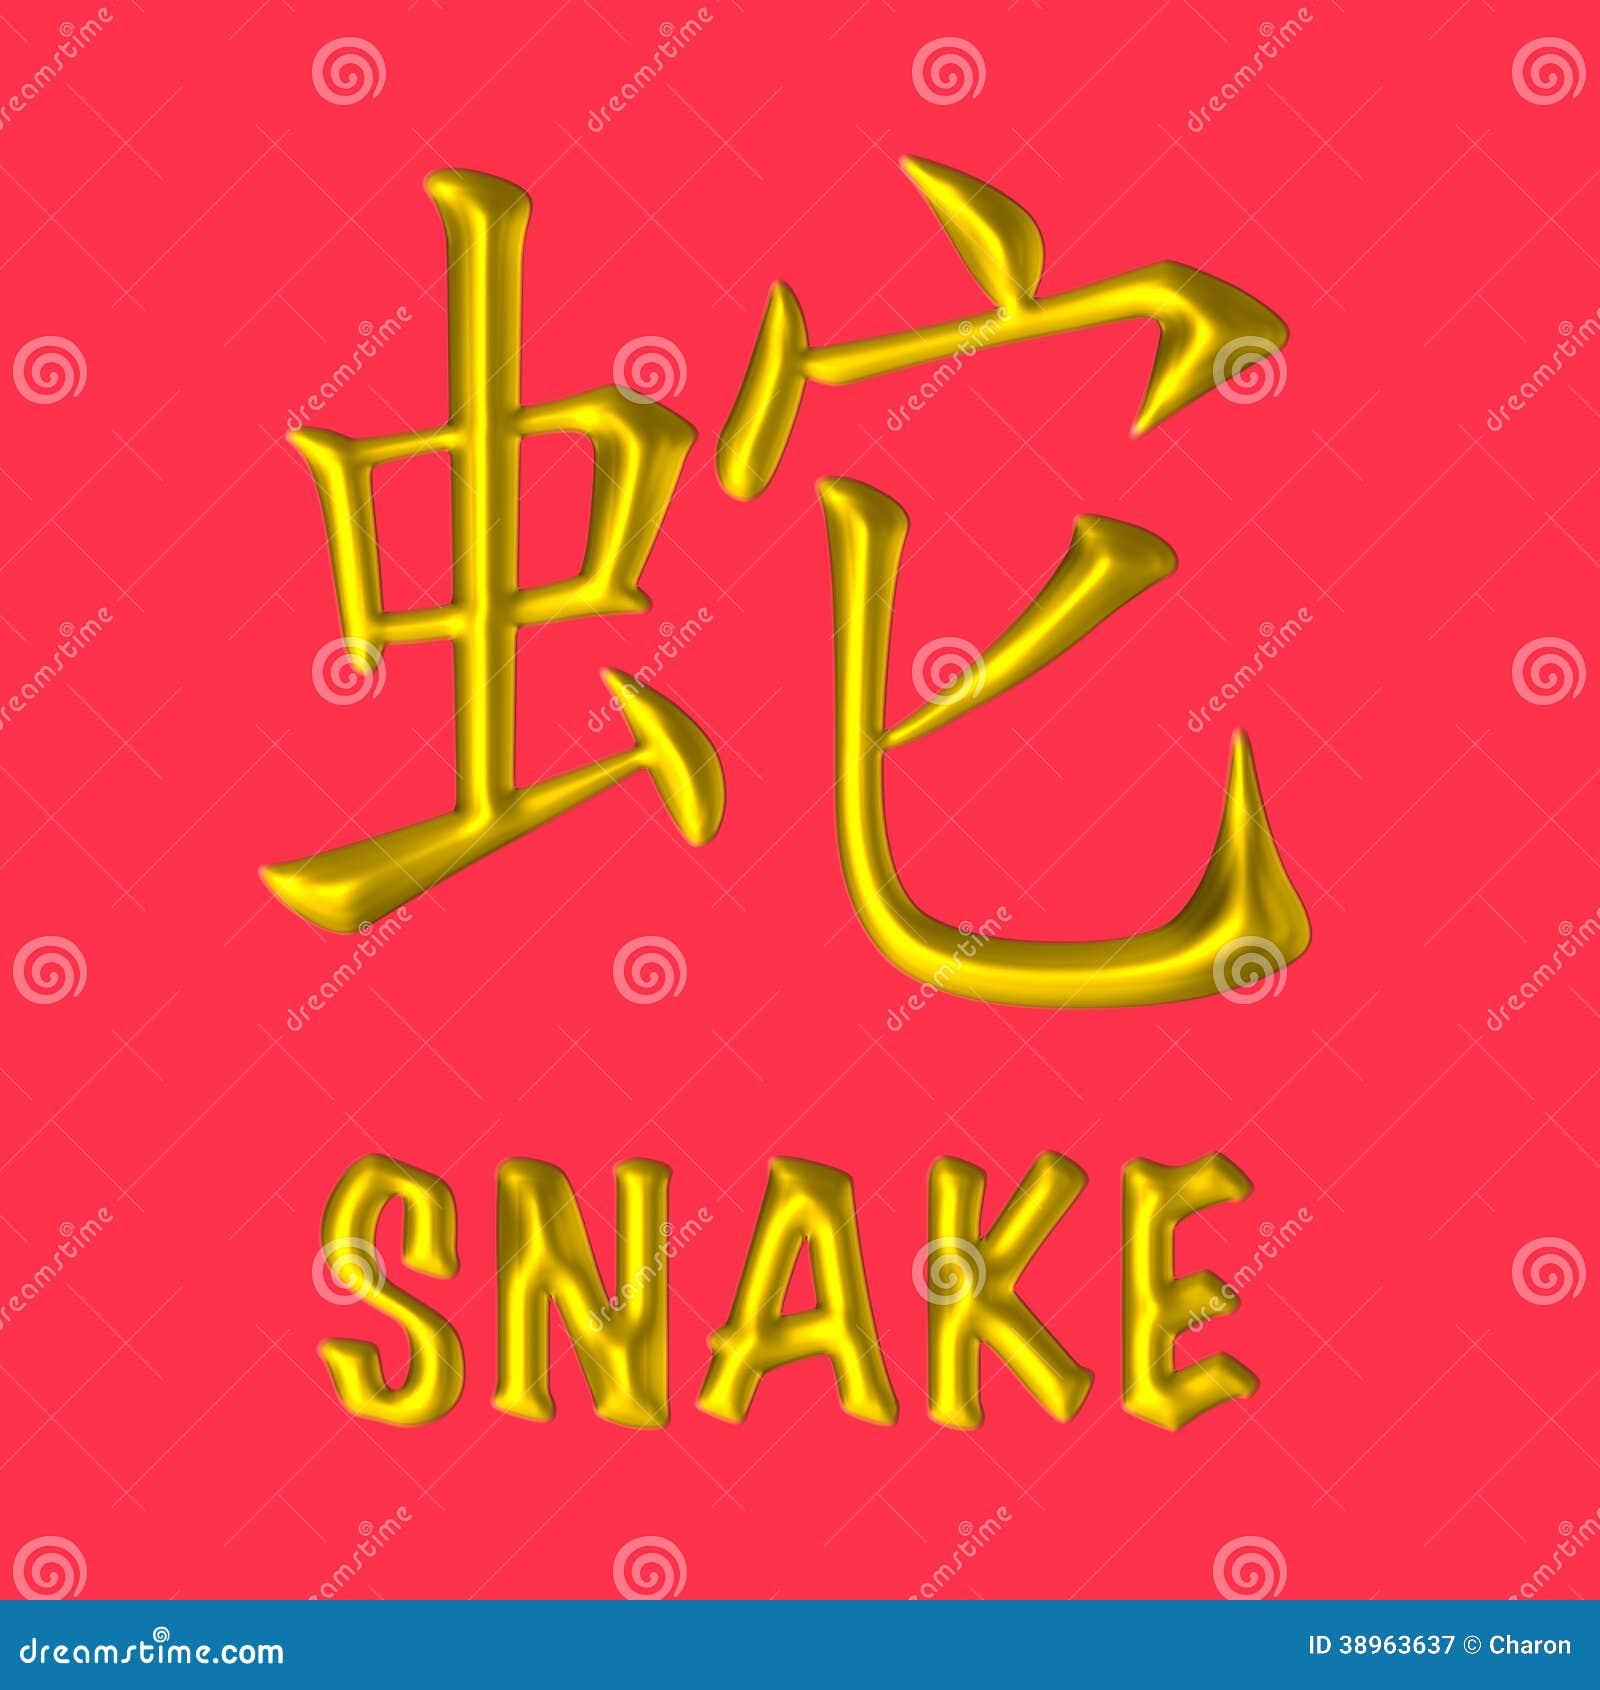 Snake golden chinese zodiac stock illustration illustration of snake golden chinese zodiac biocorpaavc Gallery